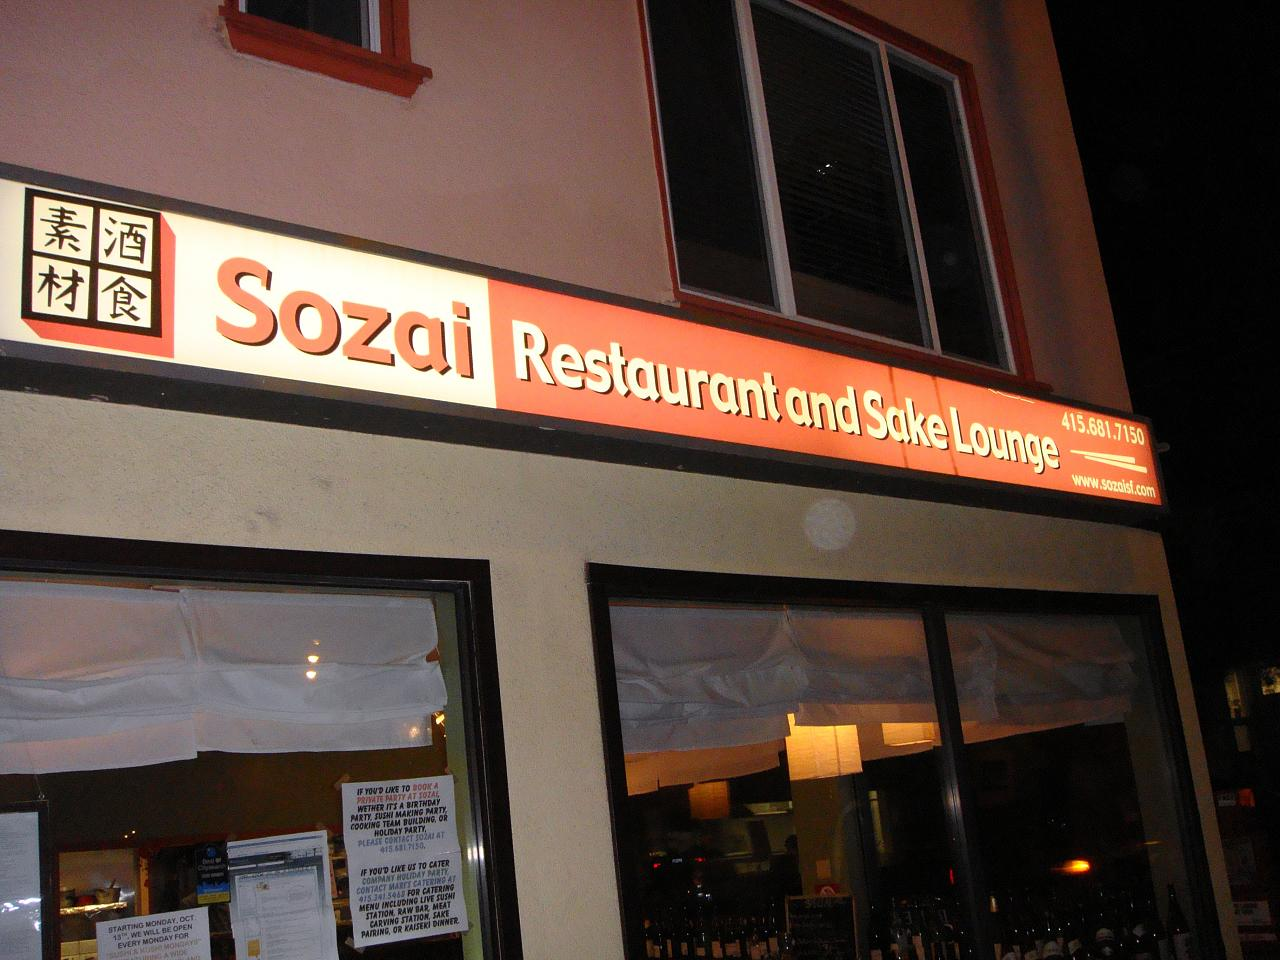 Sozai Restaurant